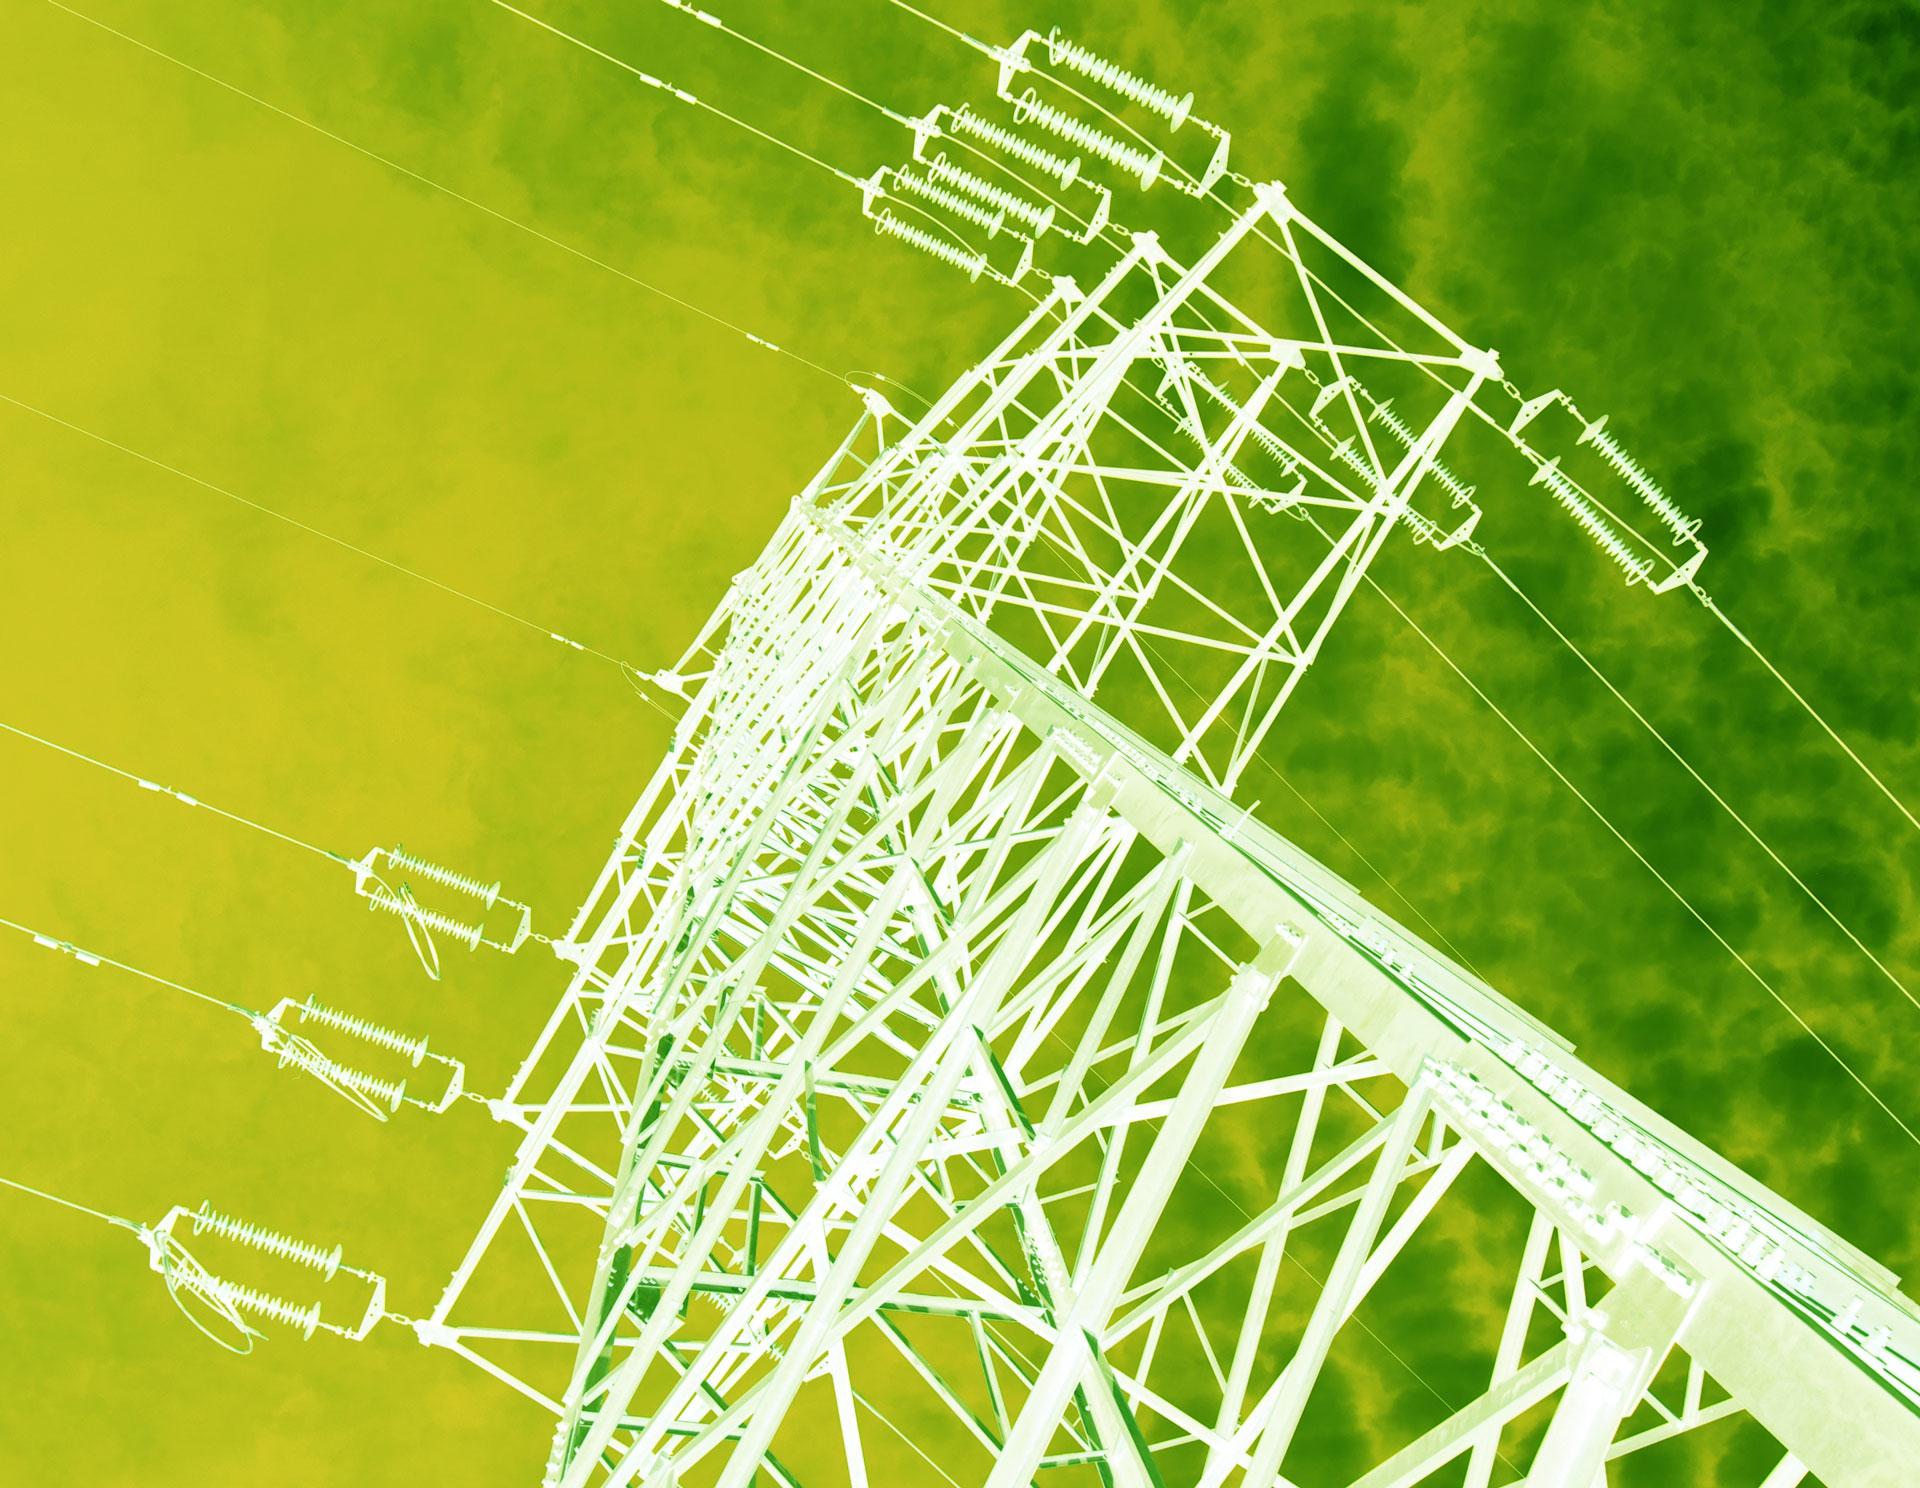 Dark times ahead as cybercriminals target power grids